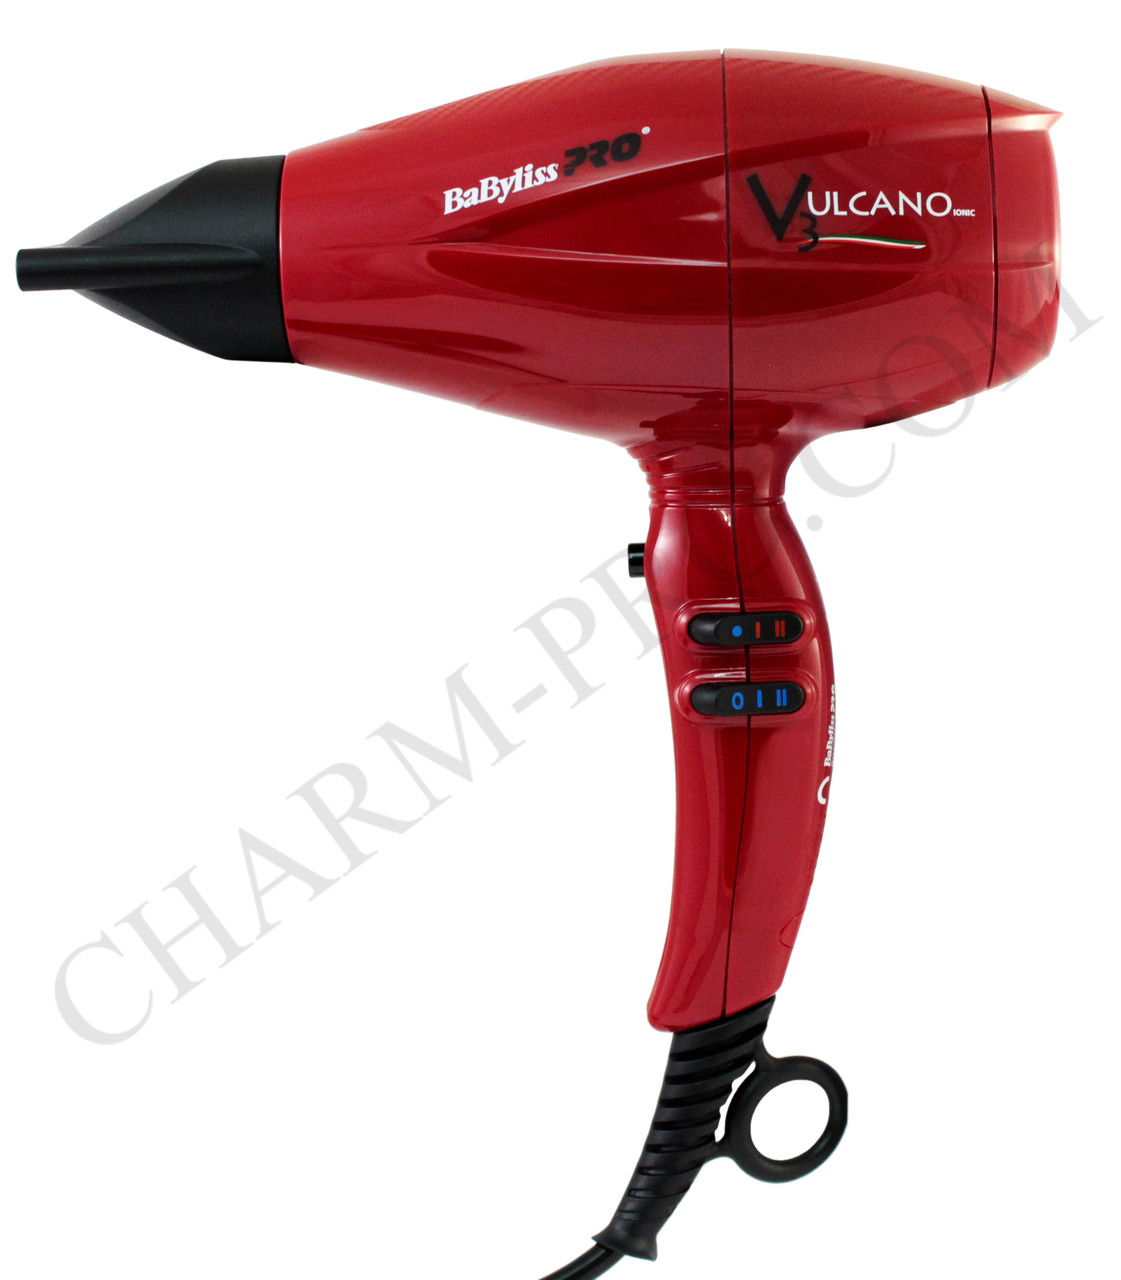 Фен для волосся Babyliss Vulcano Ionic 2200w (мод. 6180)